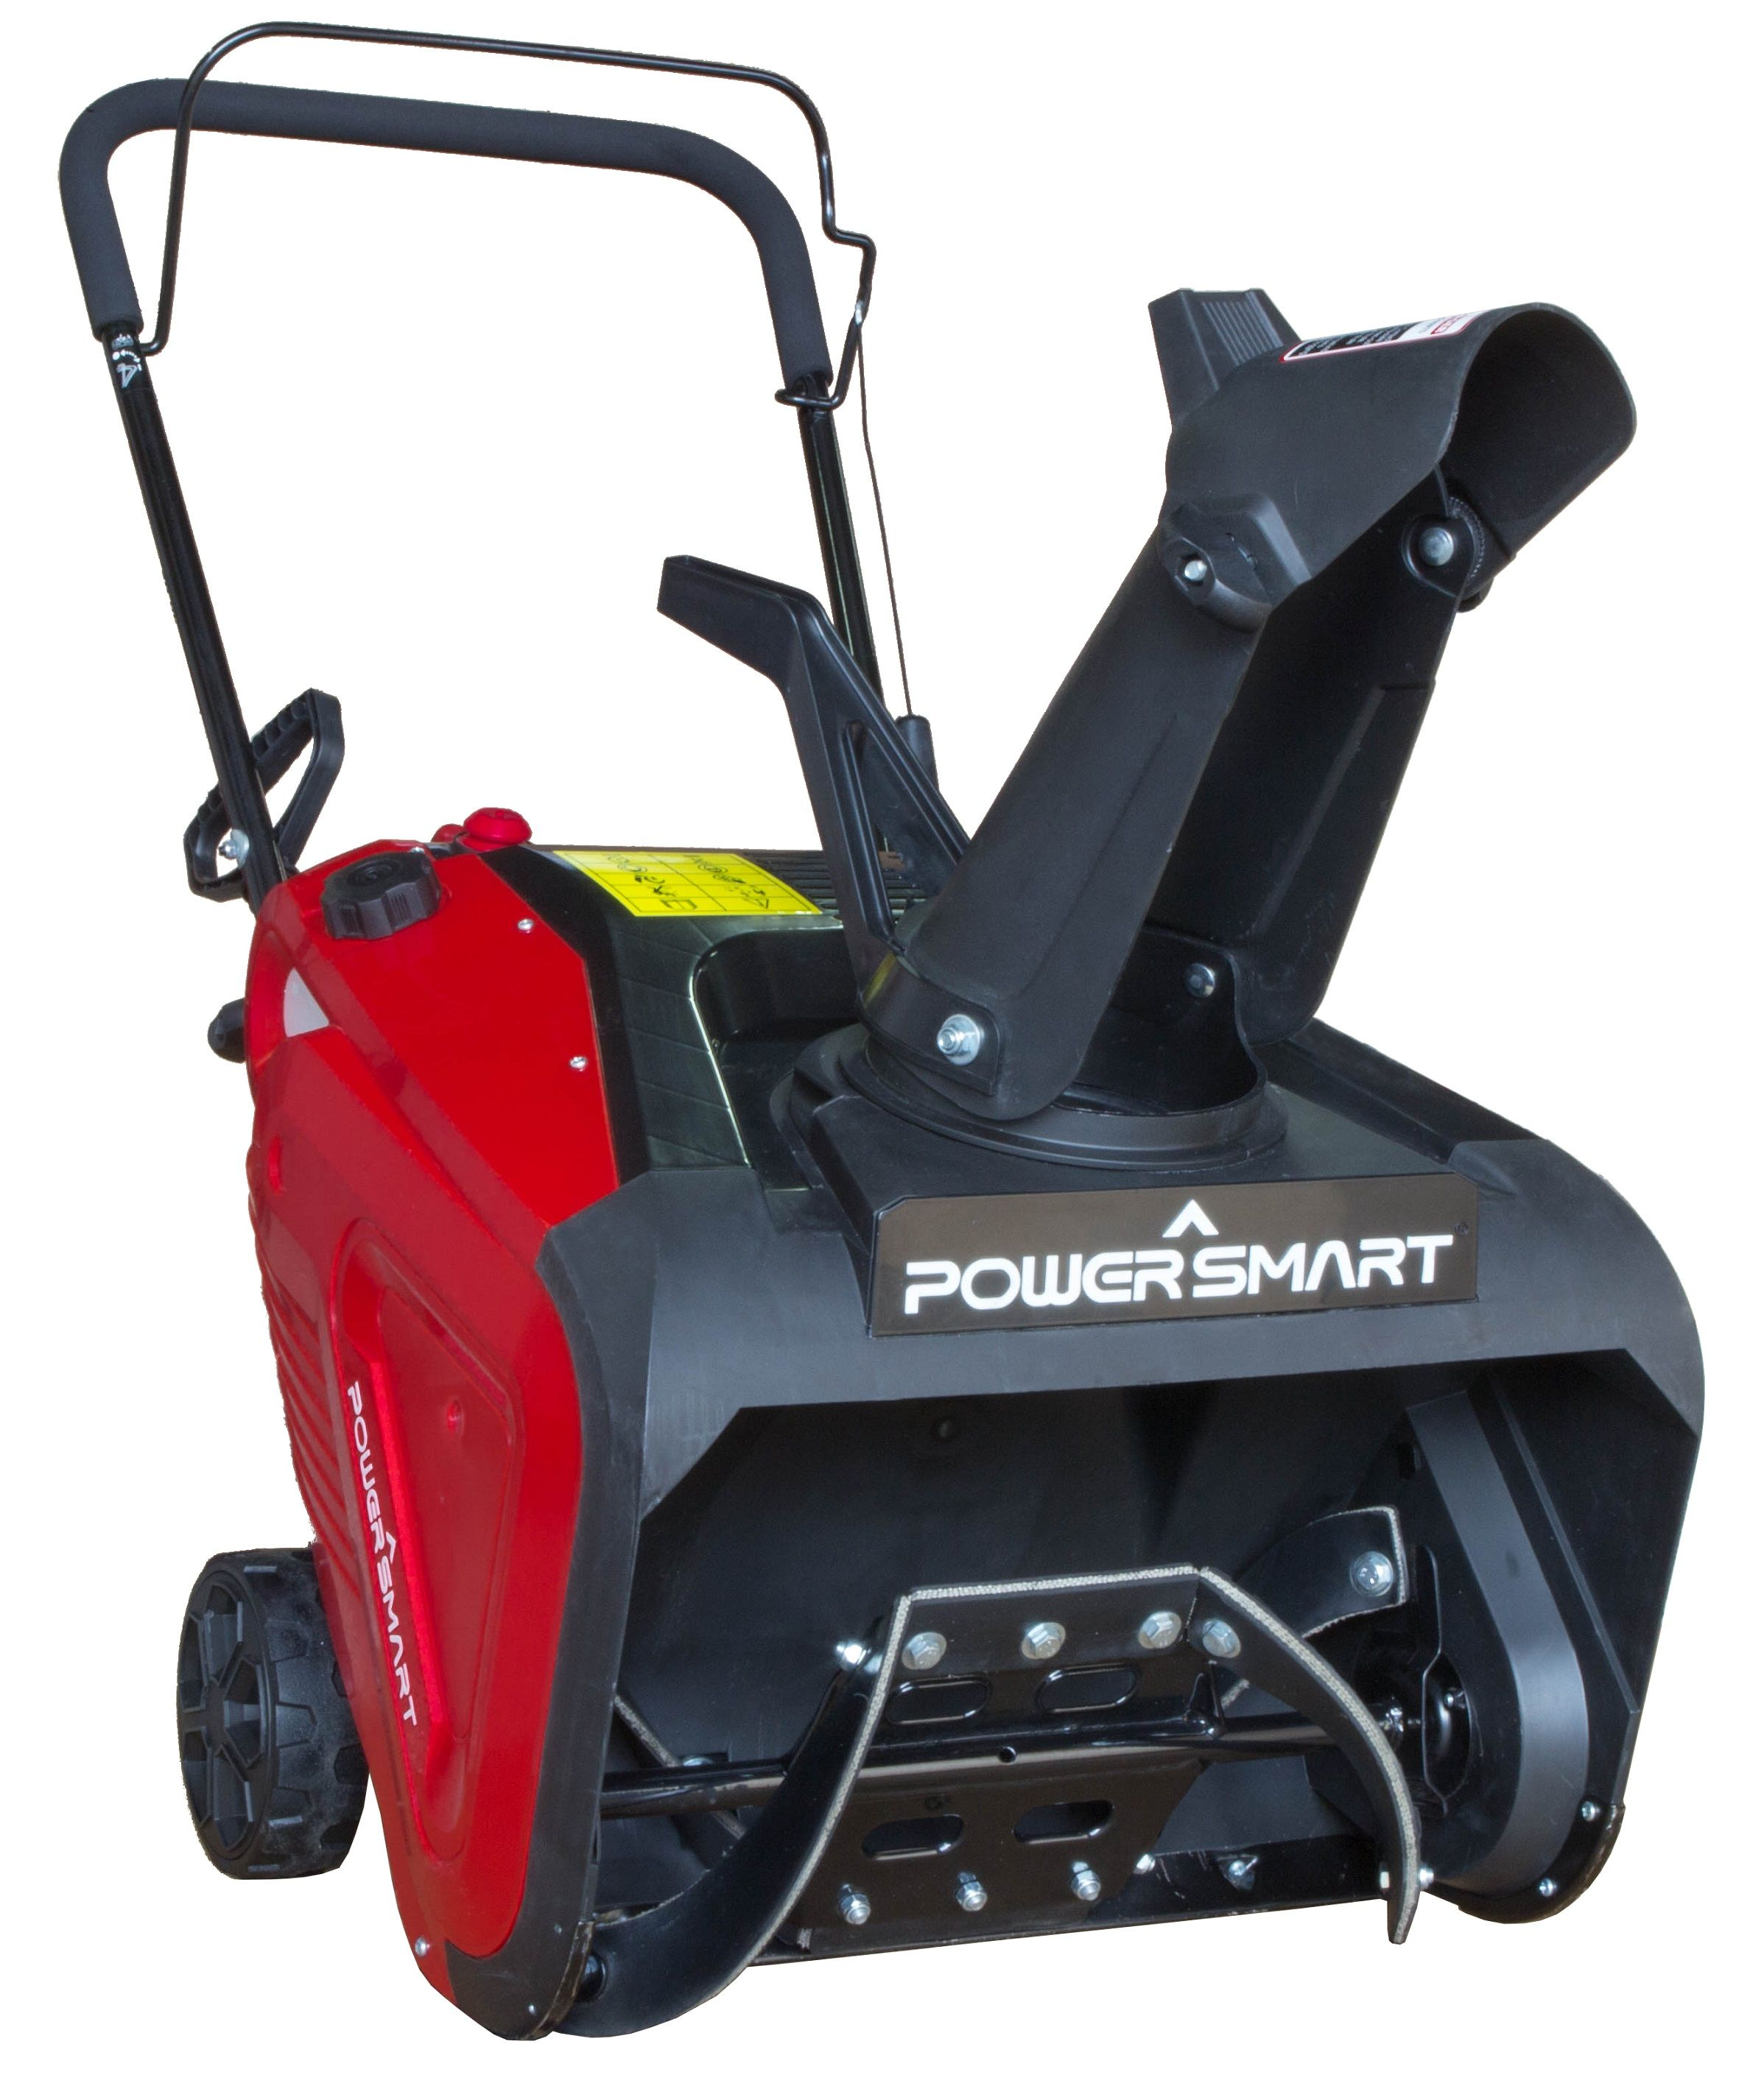 medium resolution of power smart db7005 21 196cc manual start single stage snow blower